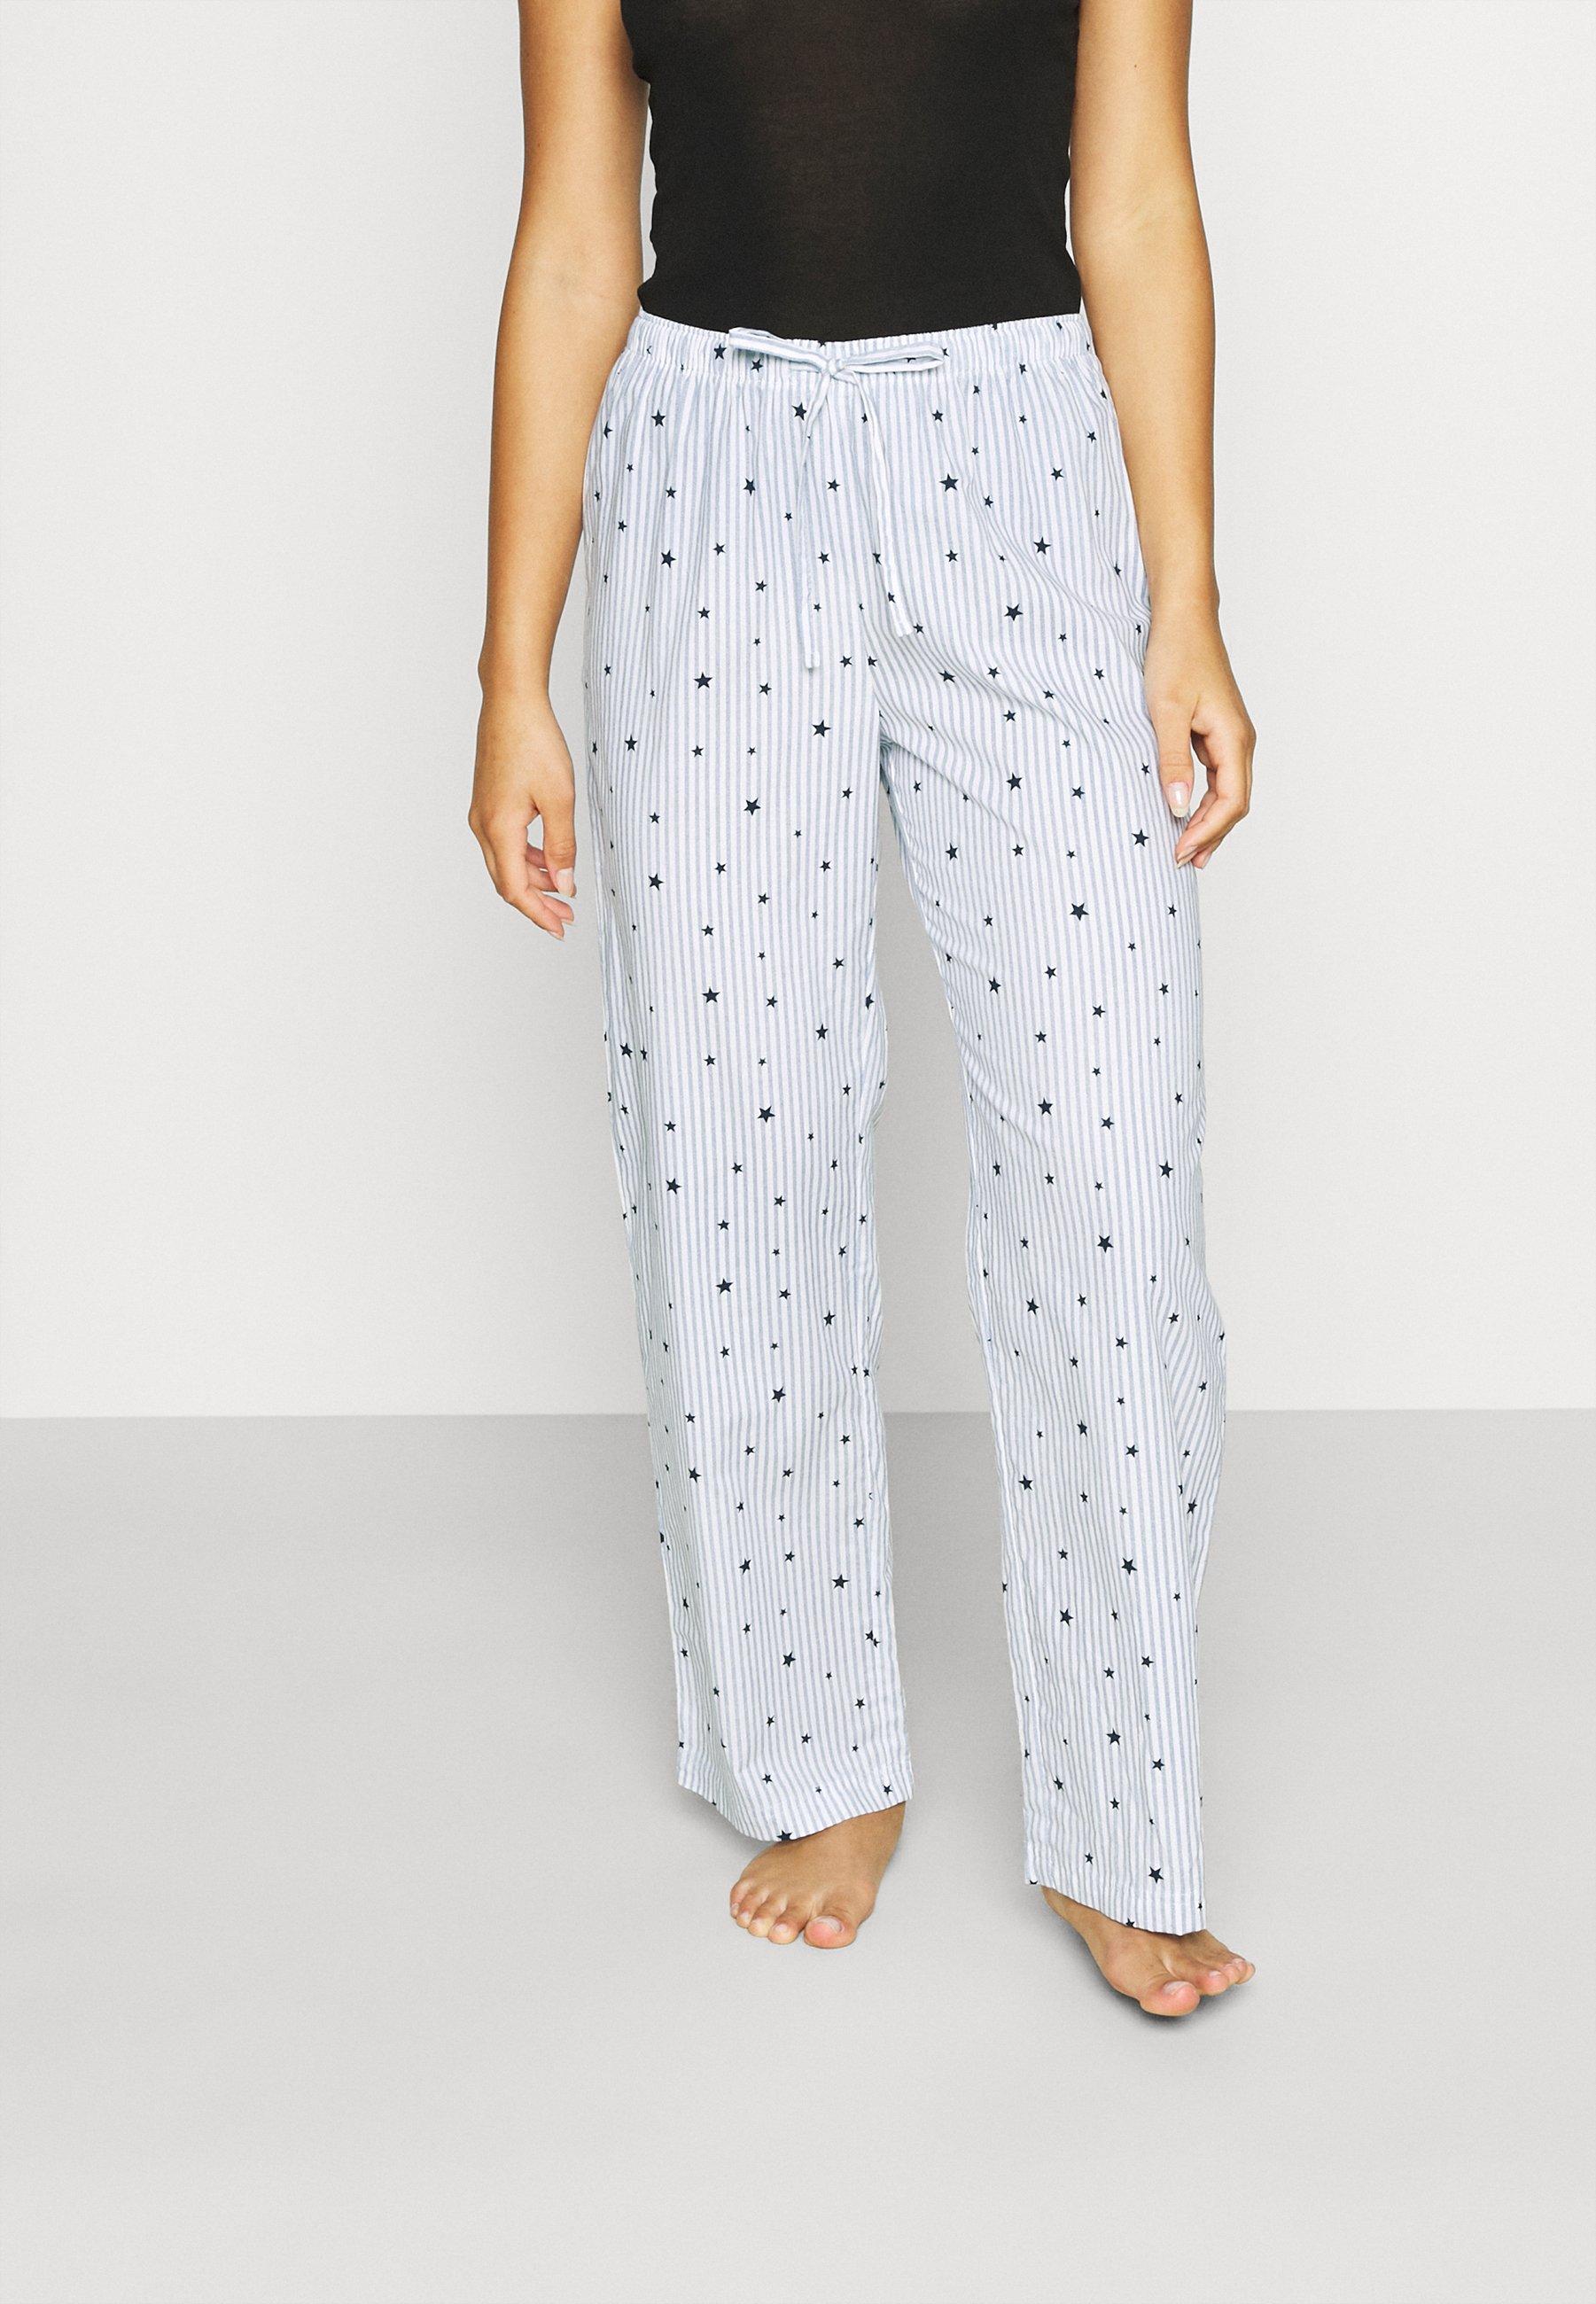 Damen NEW PANT DRAWSTRING - Nachtwäsche Hose